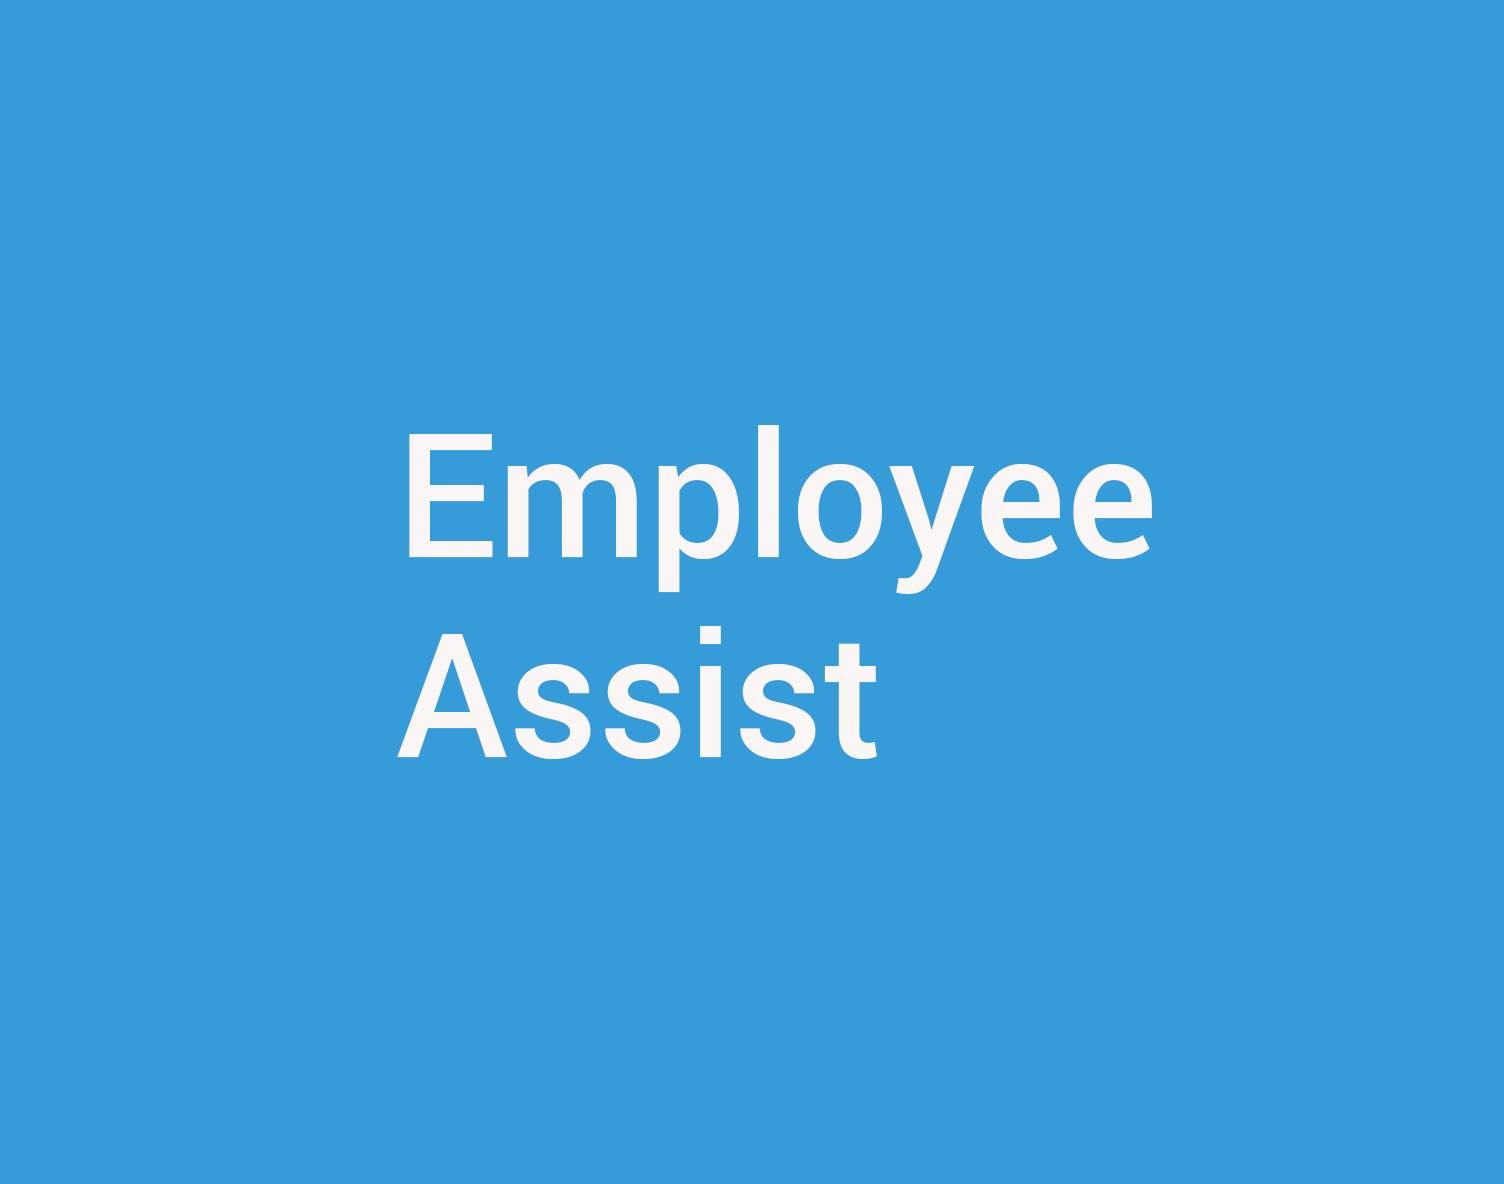 Download flyer: Employee Assist (PDF, 856kb)